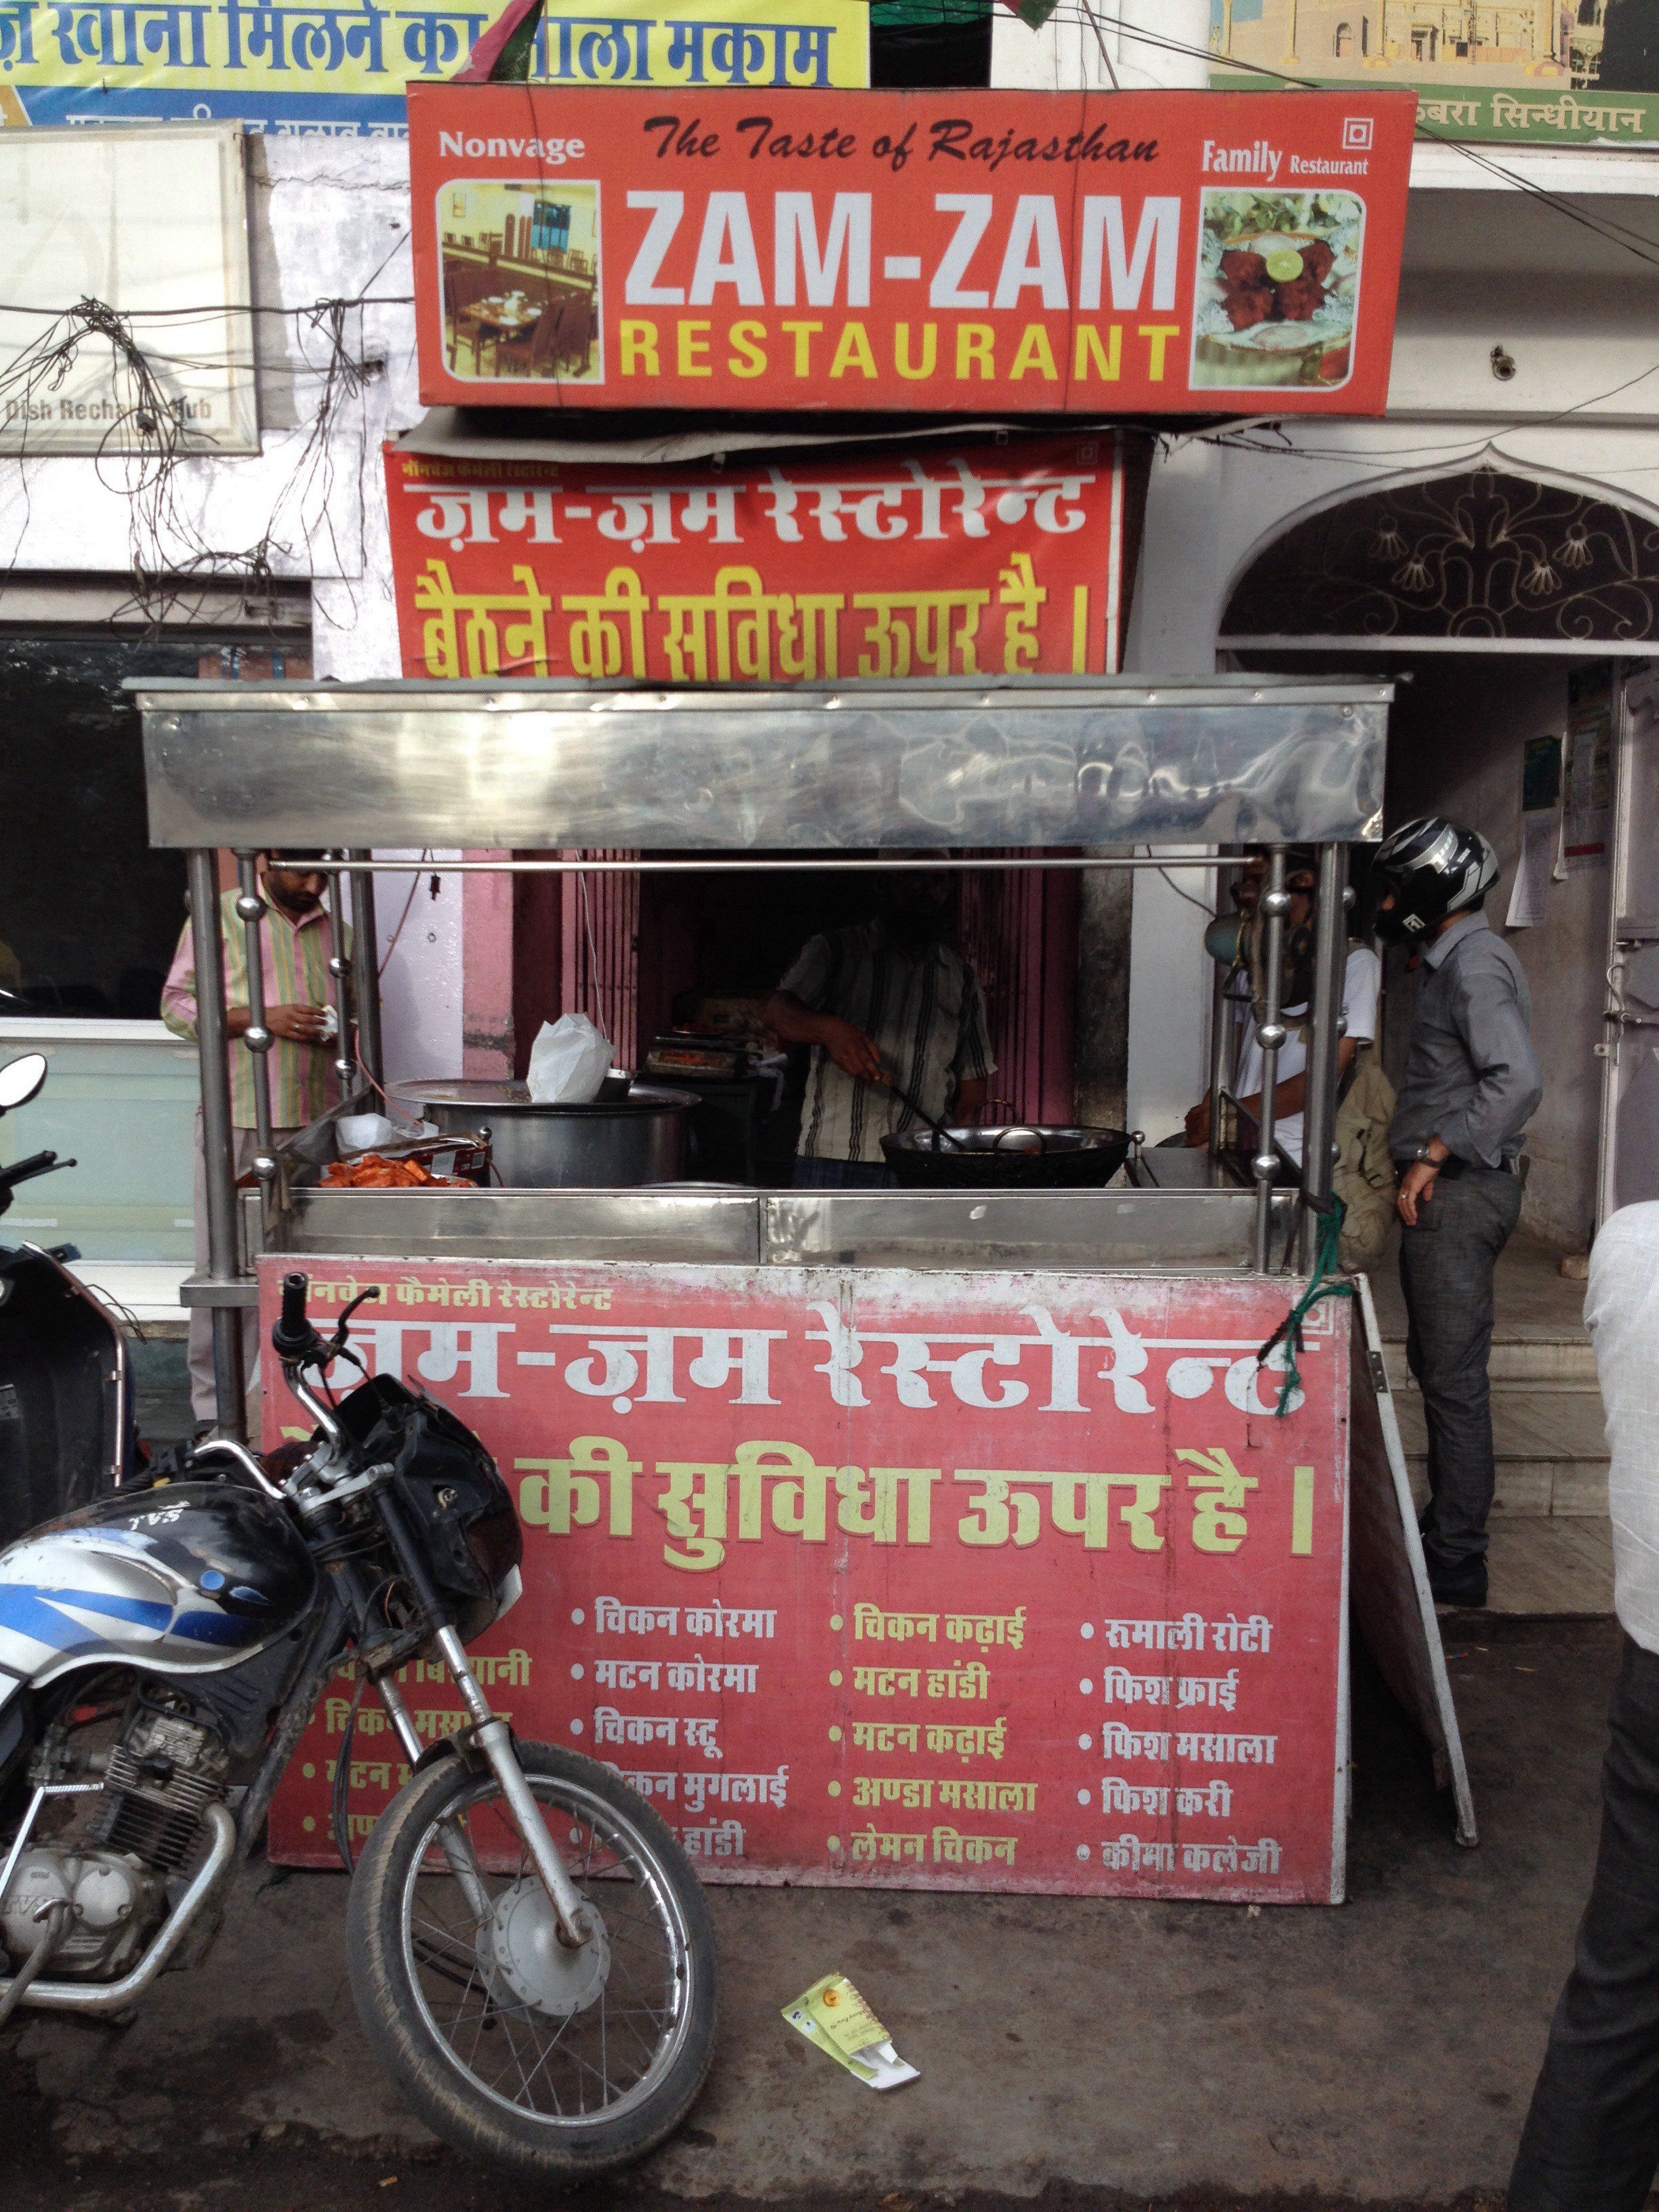 Zam Zam Restaurant - City Centre - Udaipur Image